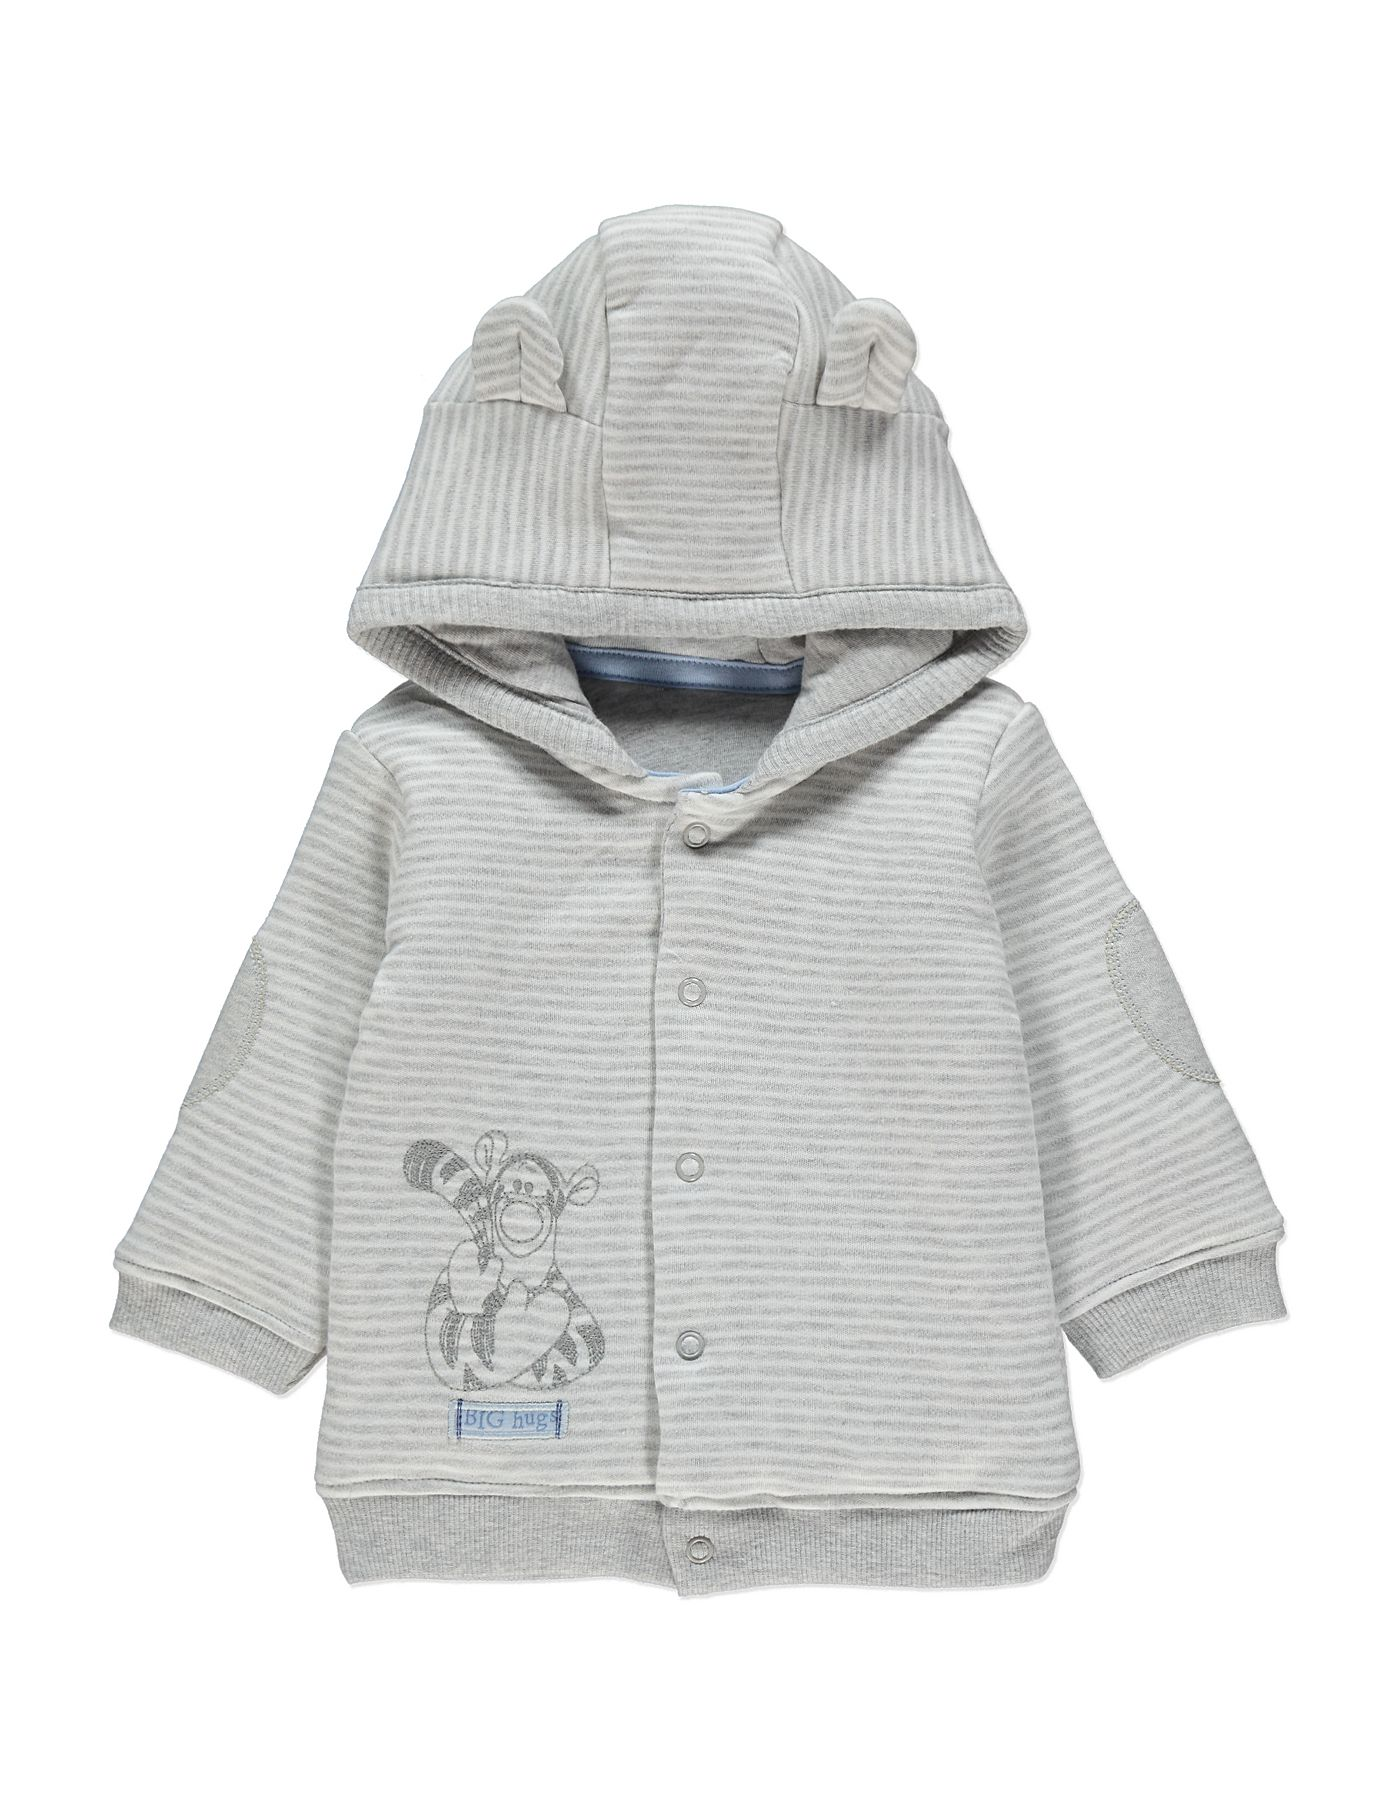 Winnie The Pooh Tigger Hoody | Baby | George at ASDA | Baby